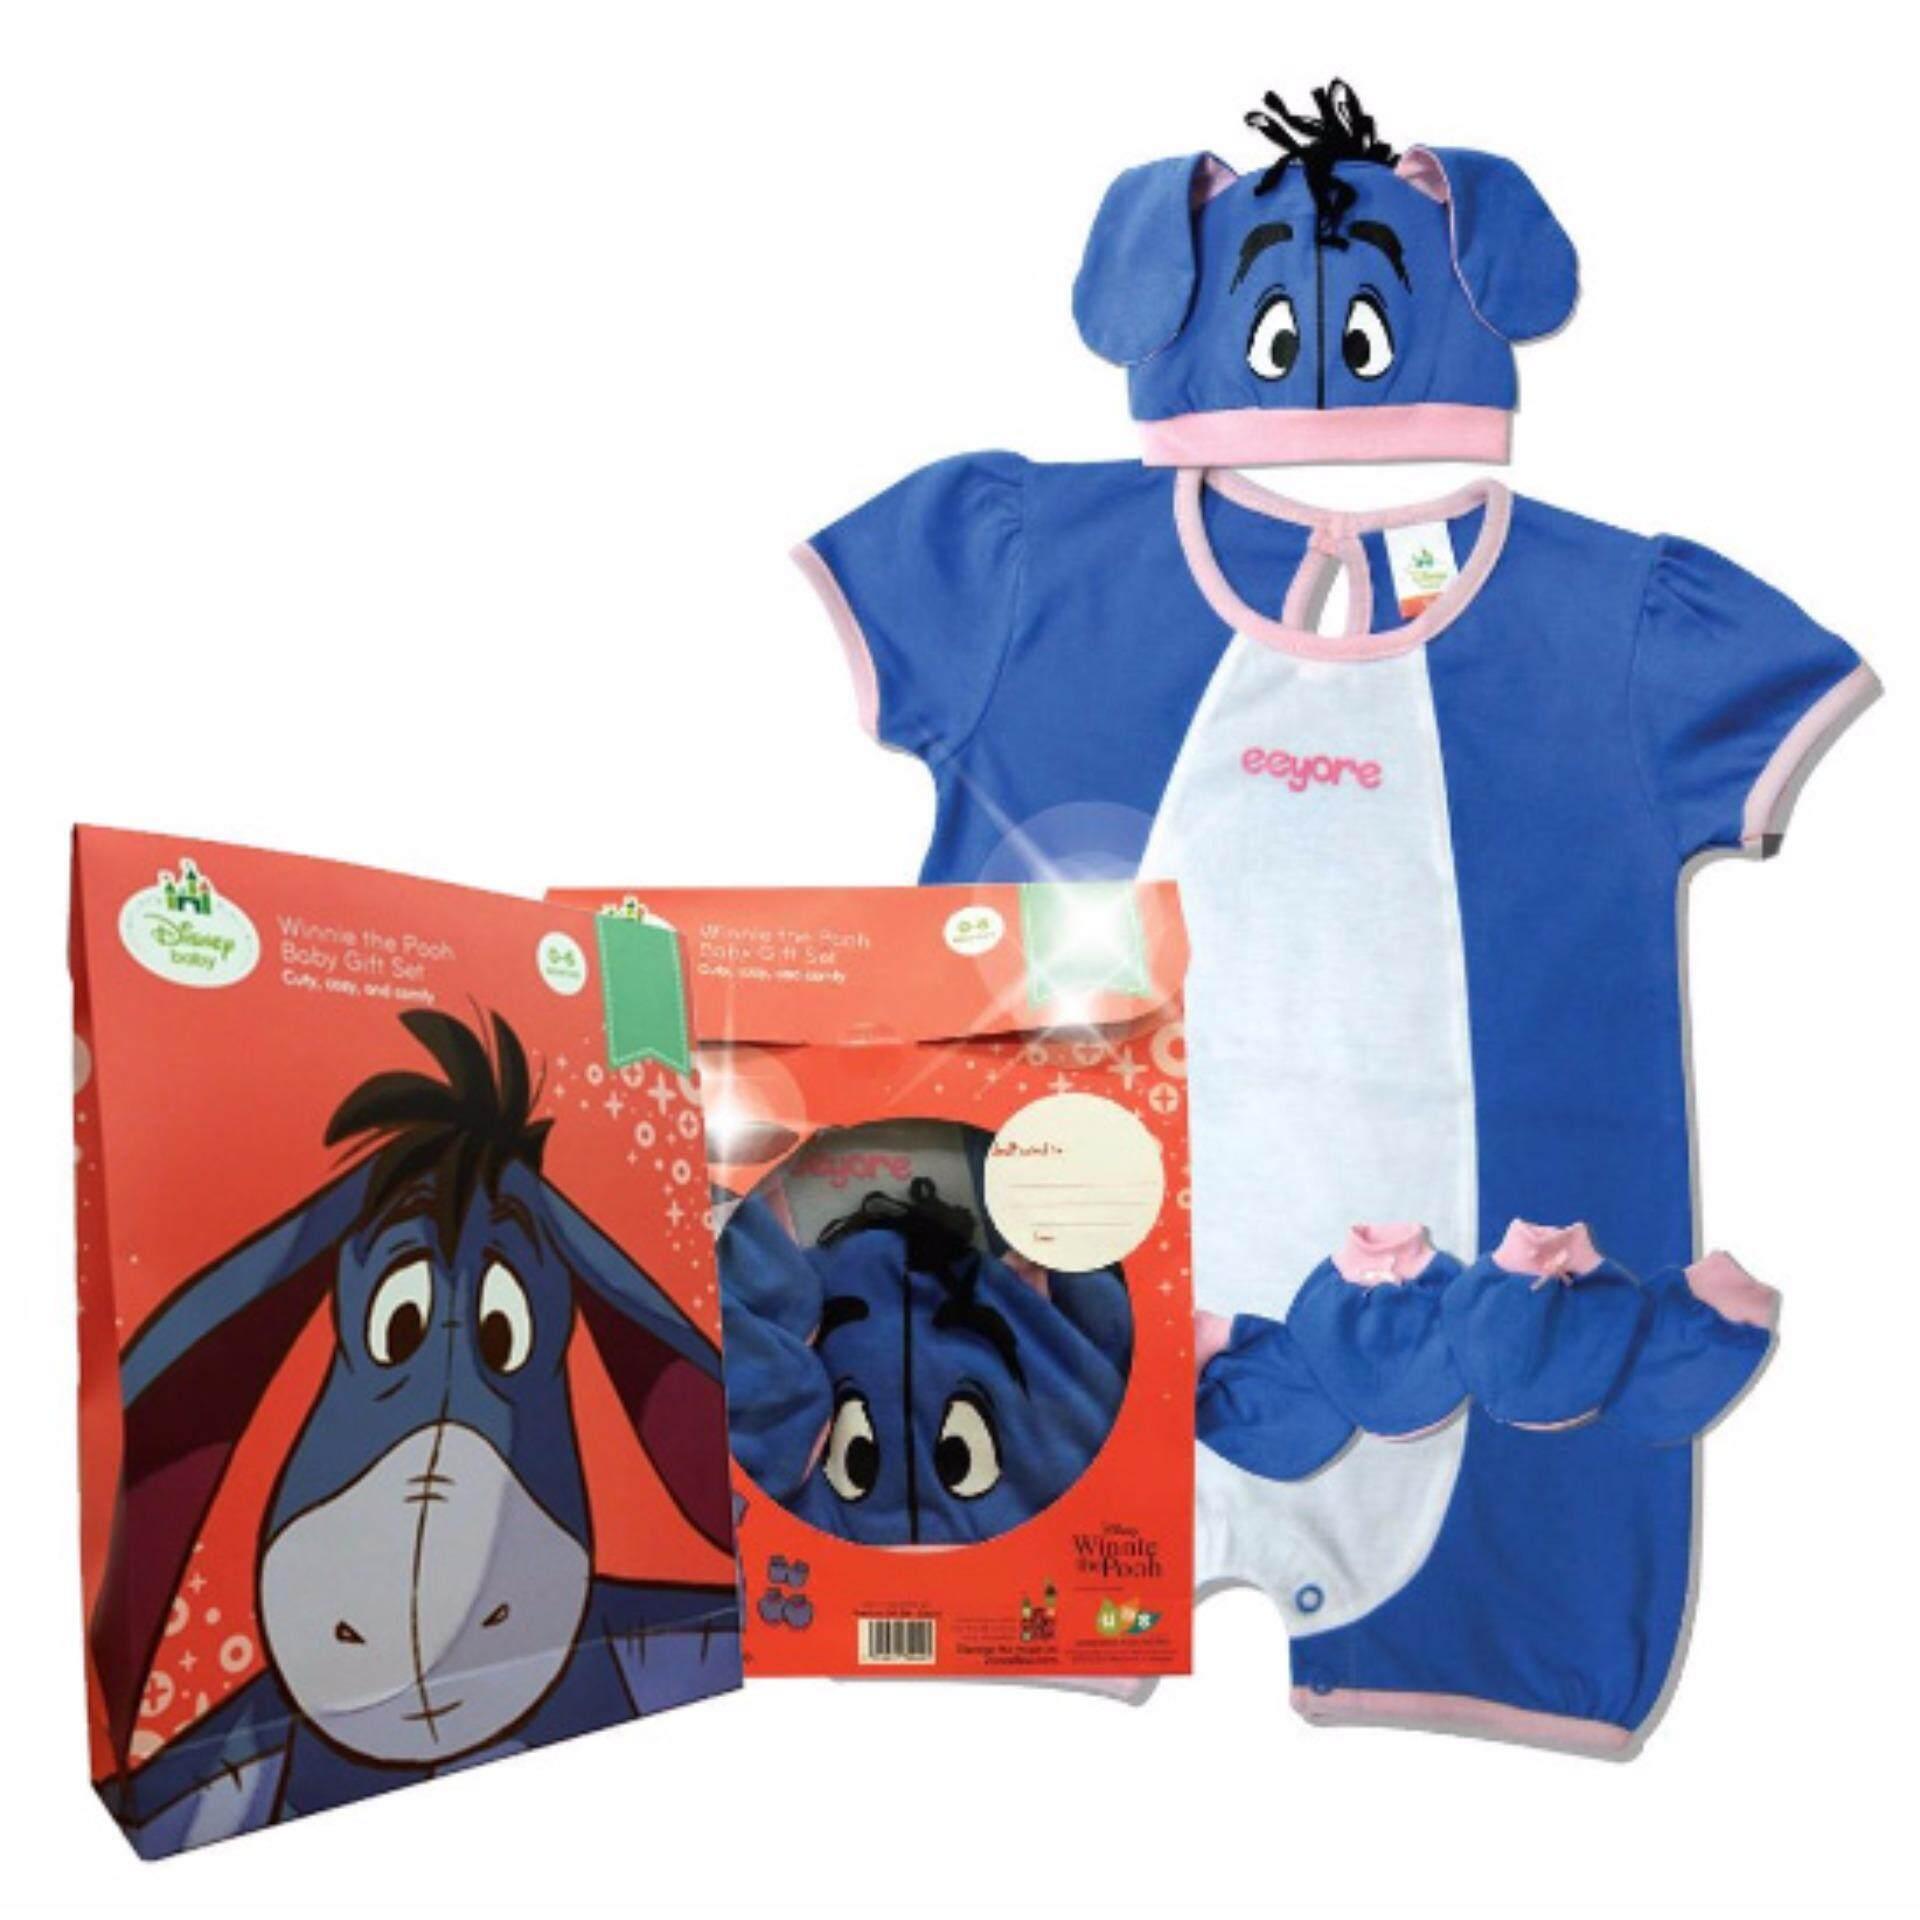 Disney Cuties Baby Premium Romper 5pcs Gift Set - Eeyore